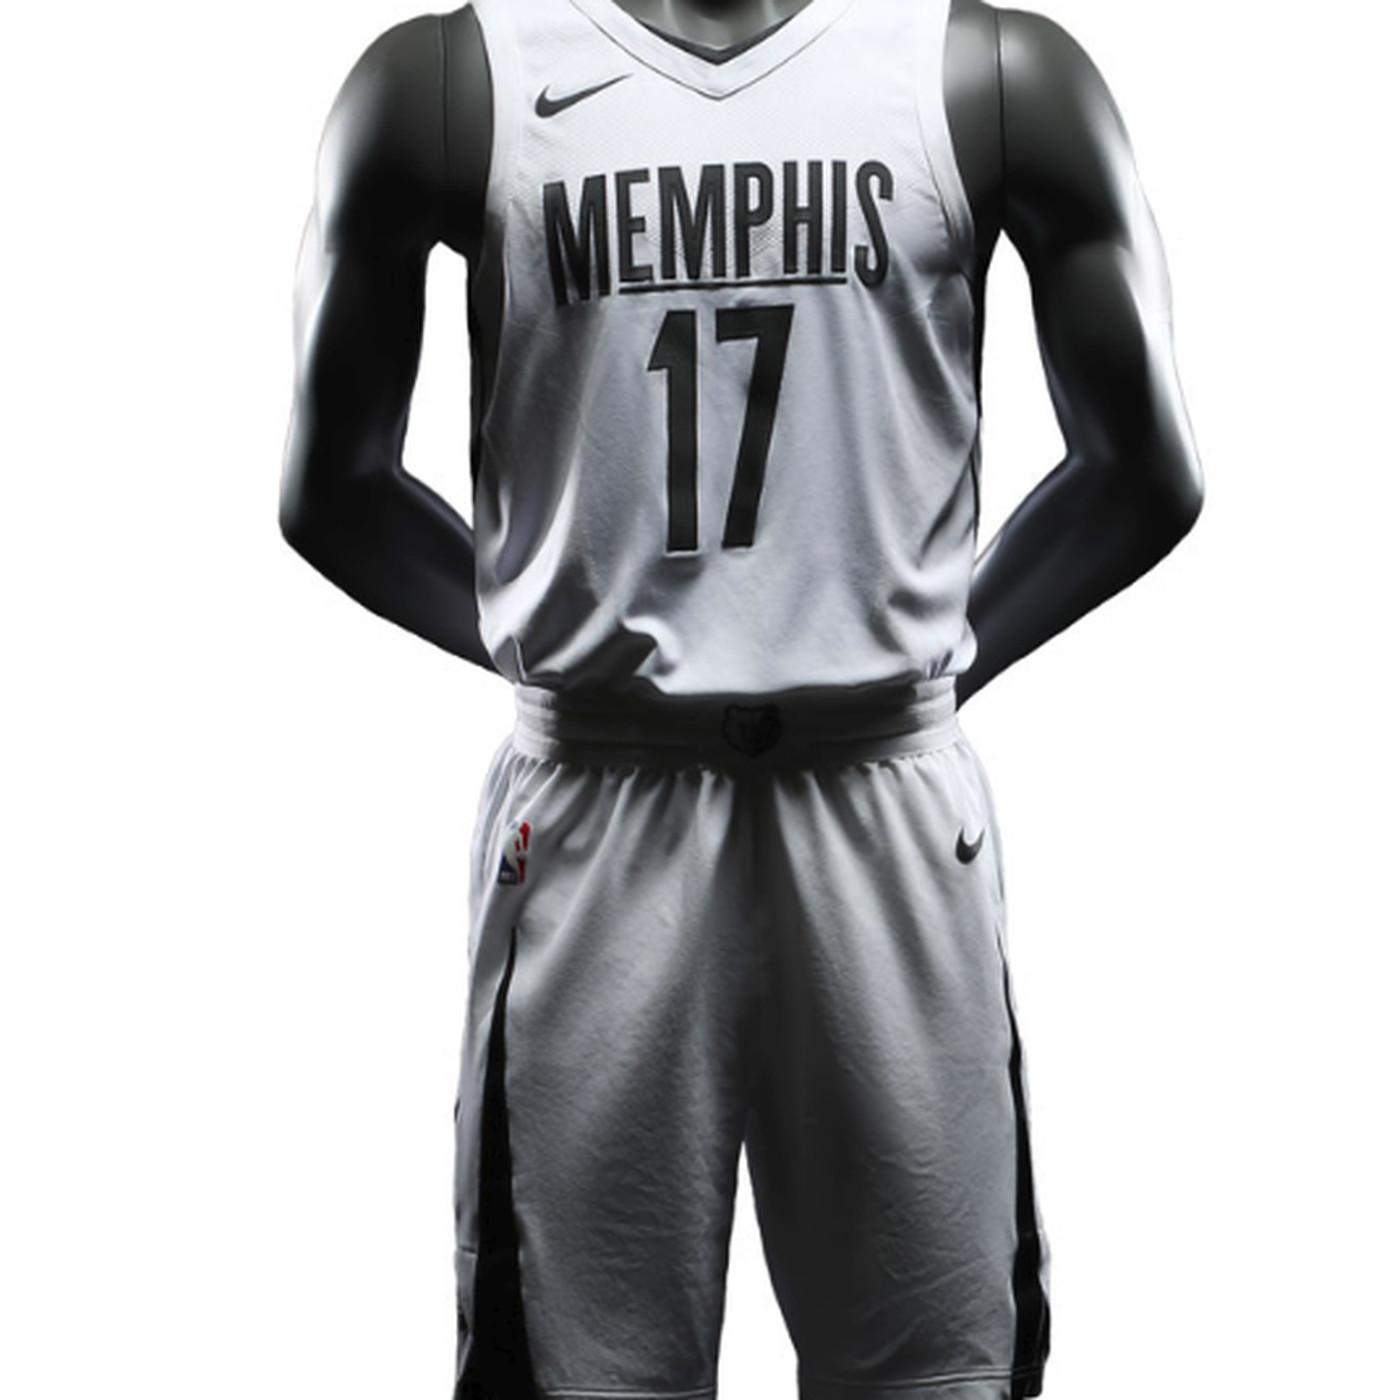 f19ff2804 Grizzlies unveil MLK50 City Edition Nike Uniform - Grizzly Bear Blues